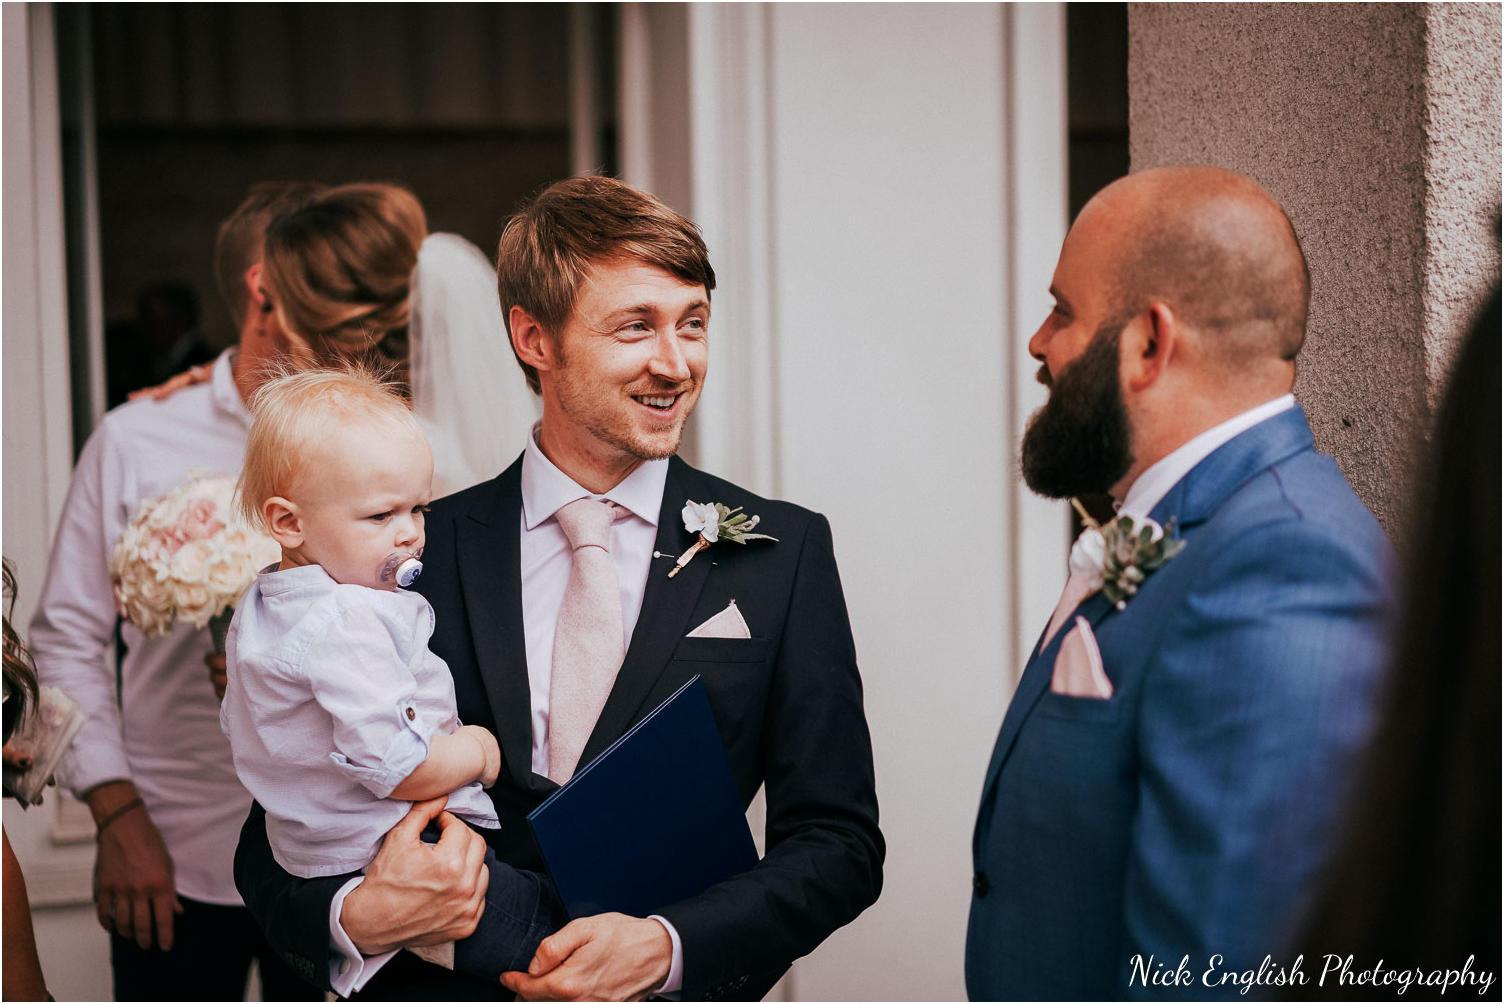 Destination_Wedding_Photographer_Slovenia_Nick_English_Photography-53.jpg